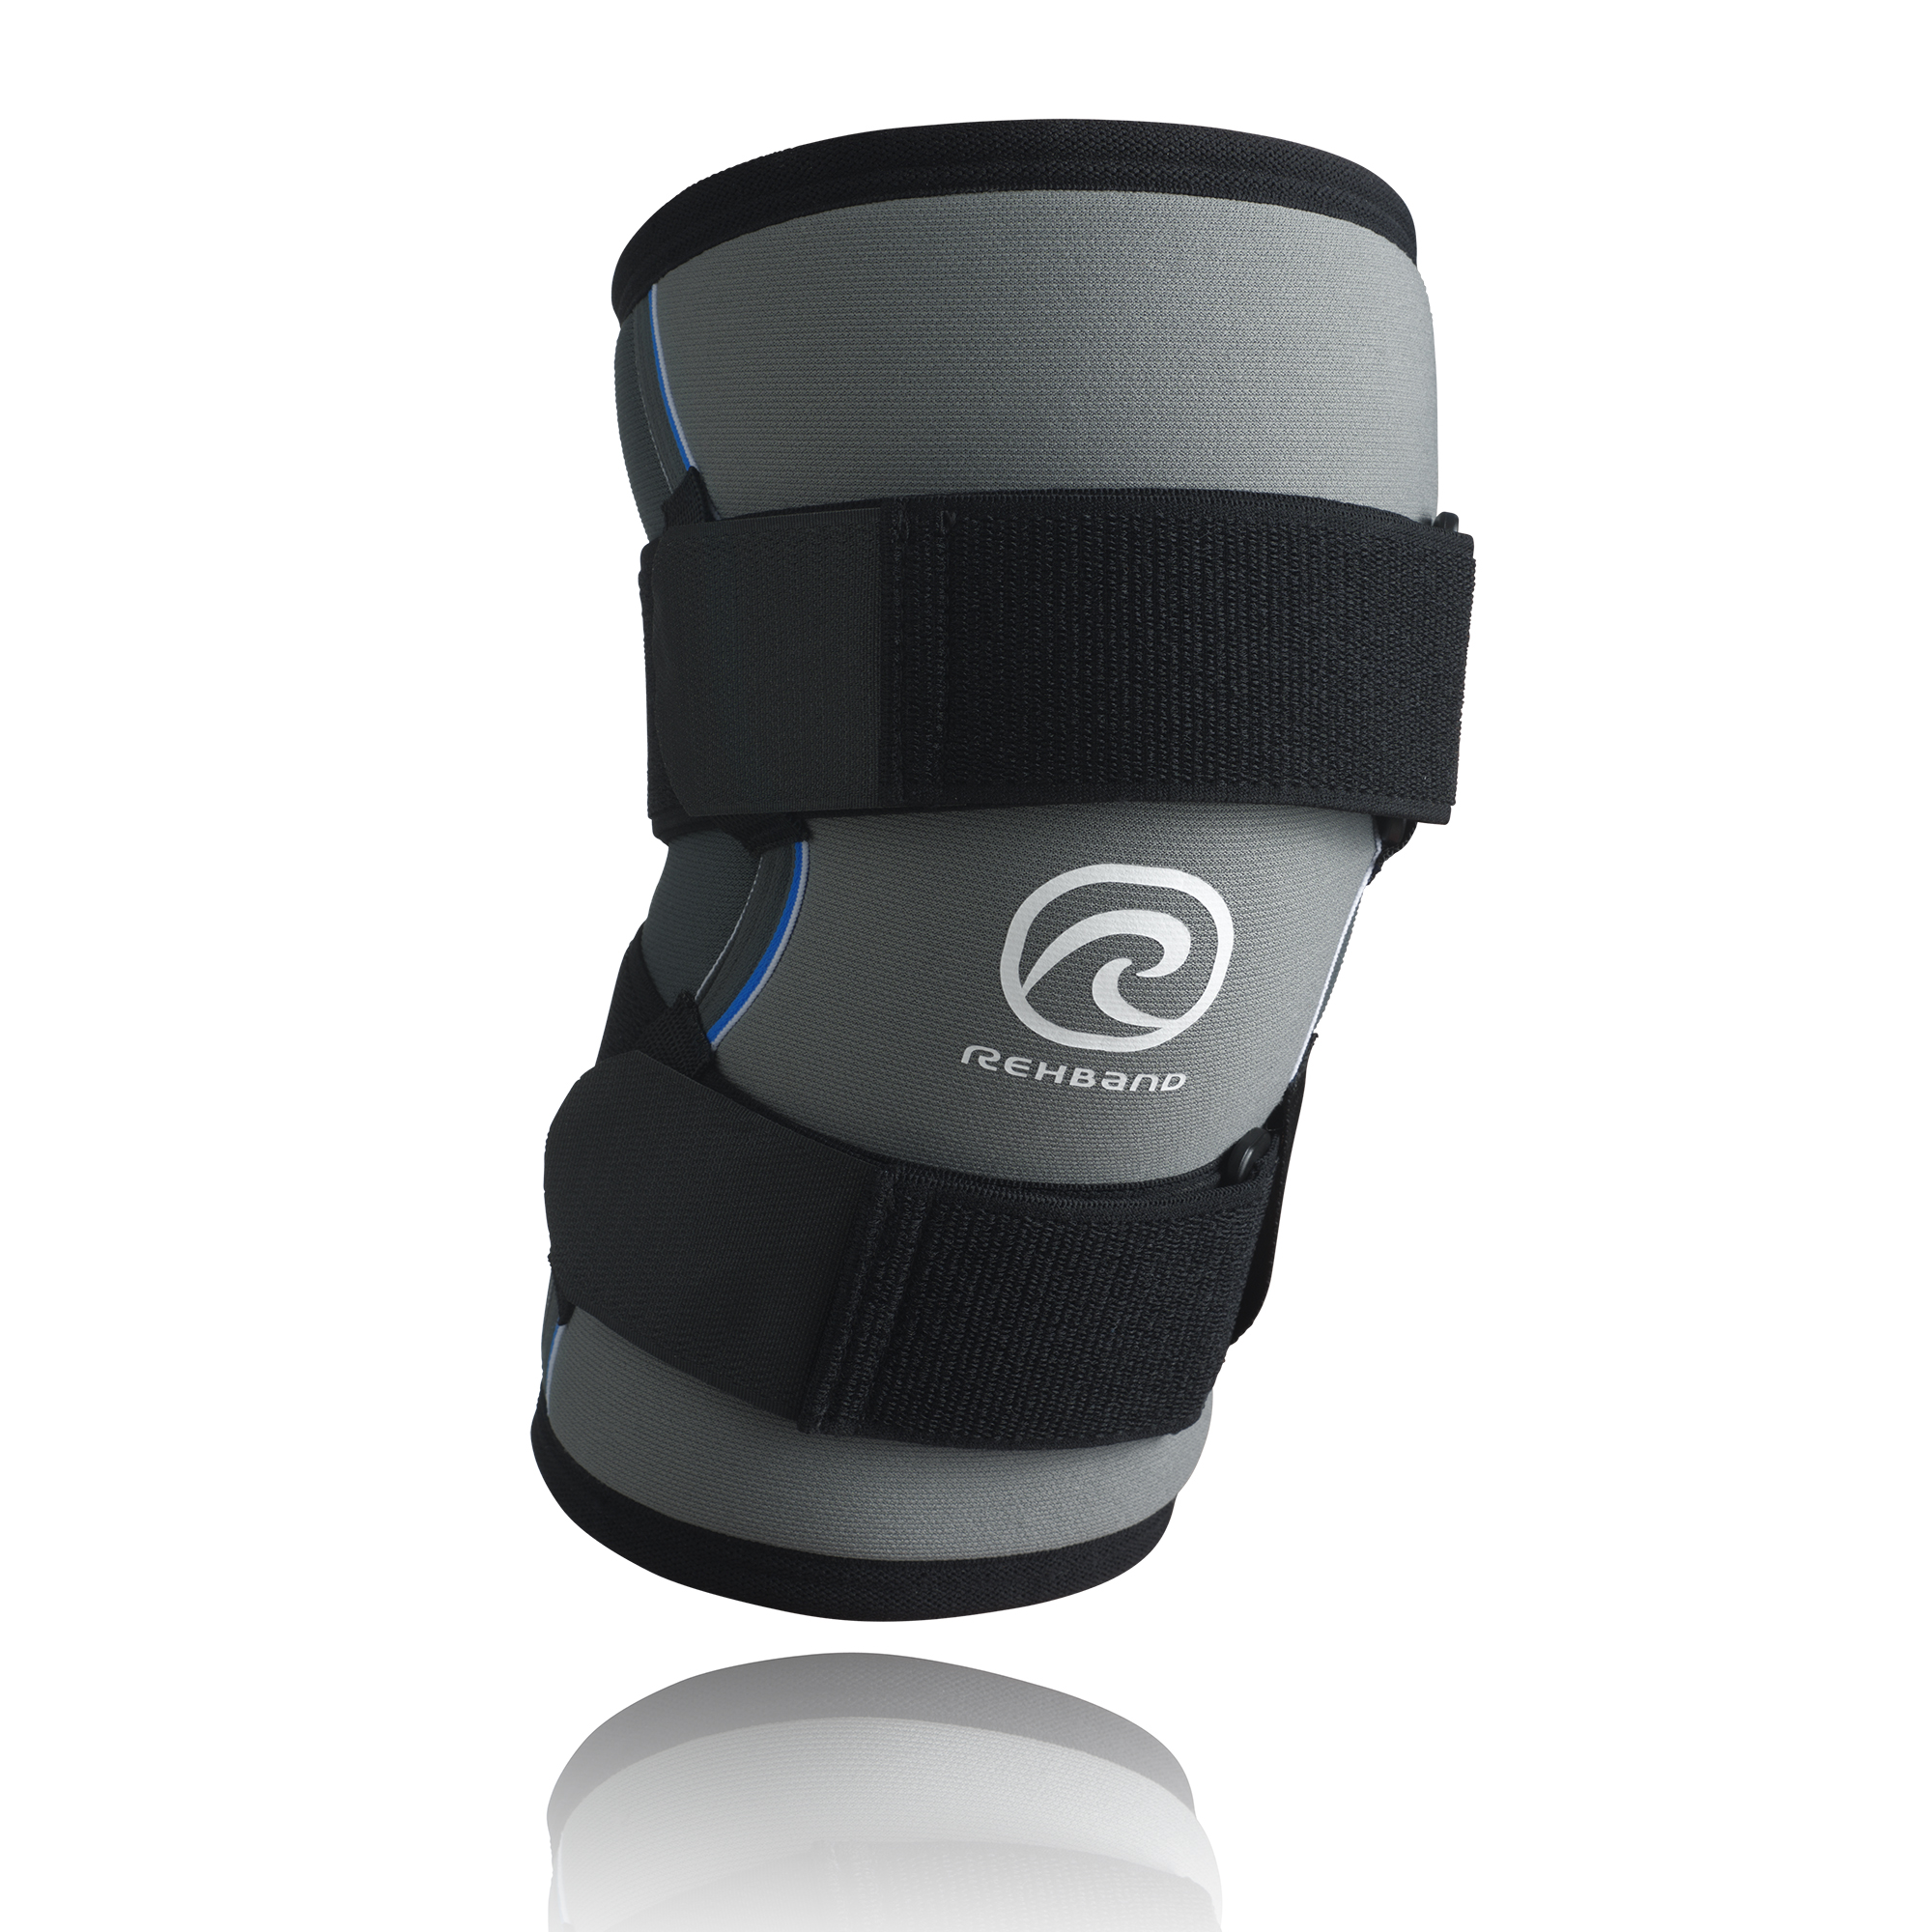 5c400d6ac7 Rehband 7790 X-RX Knee Support – 7mm – Jackal's Gym